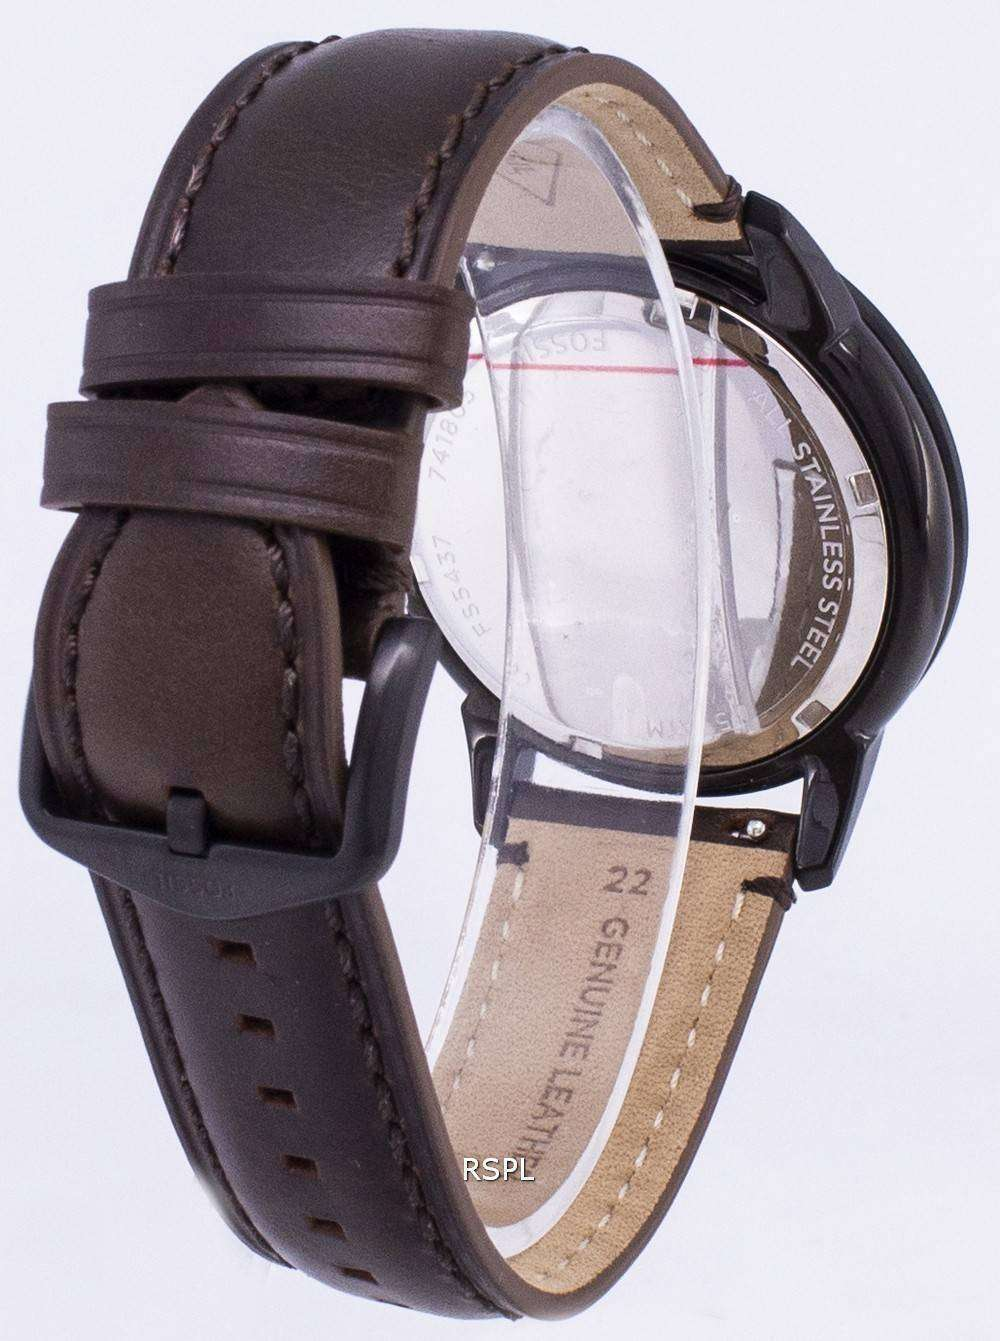 Watch Quartz Townsman Chronograph Fossil Fs5437 Men's AR534jL